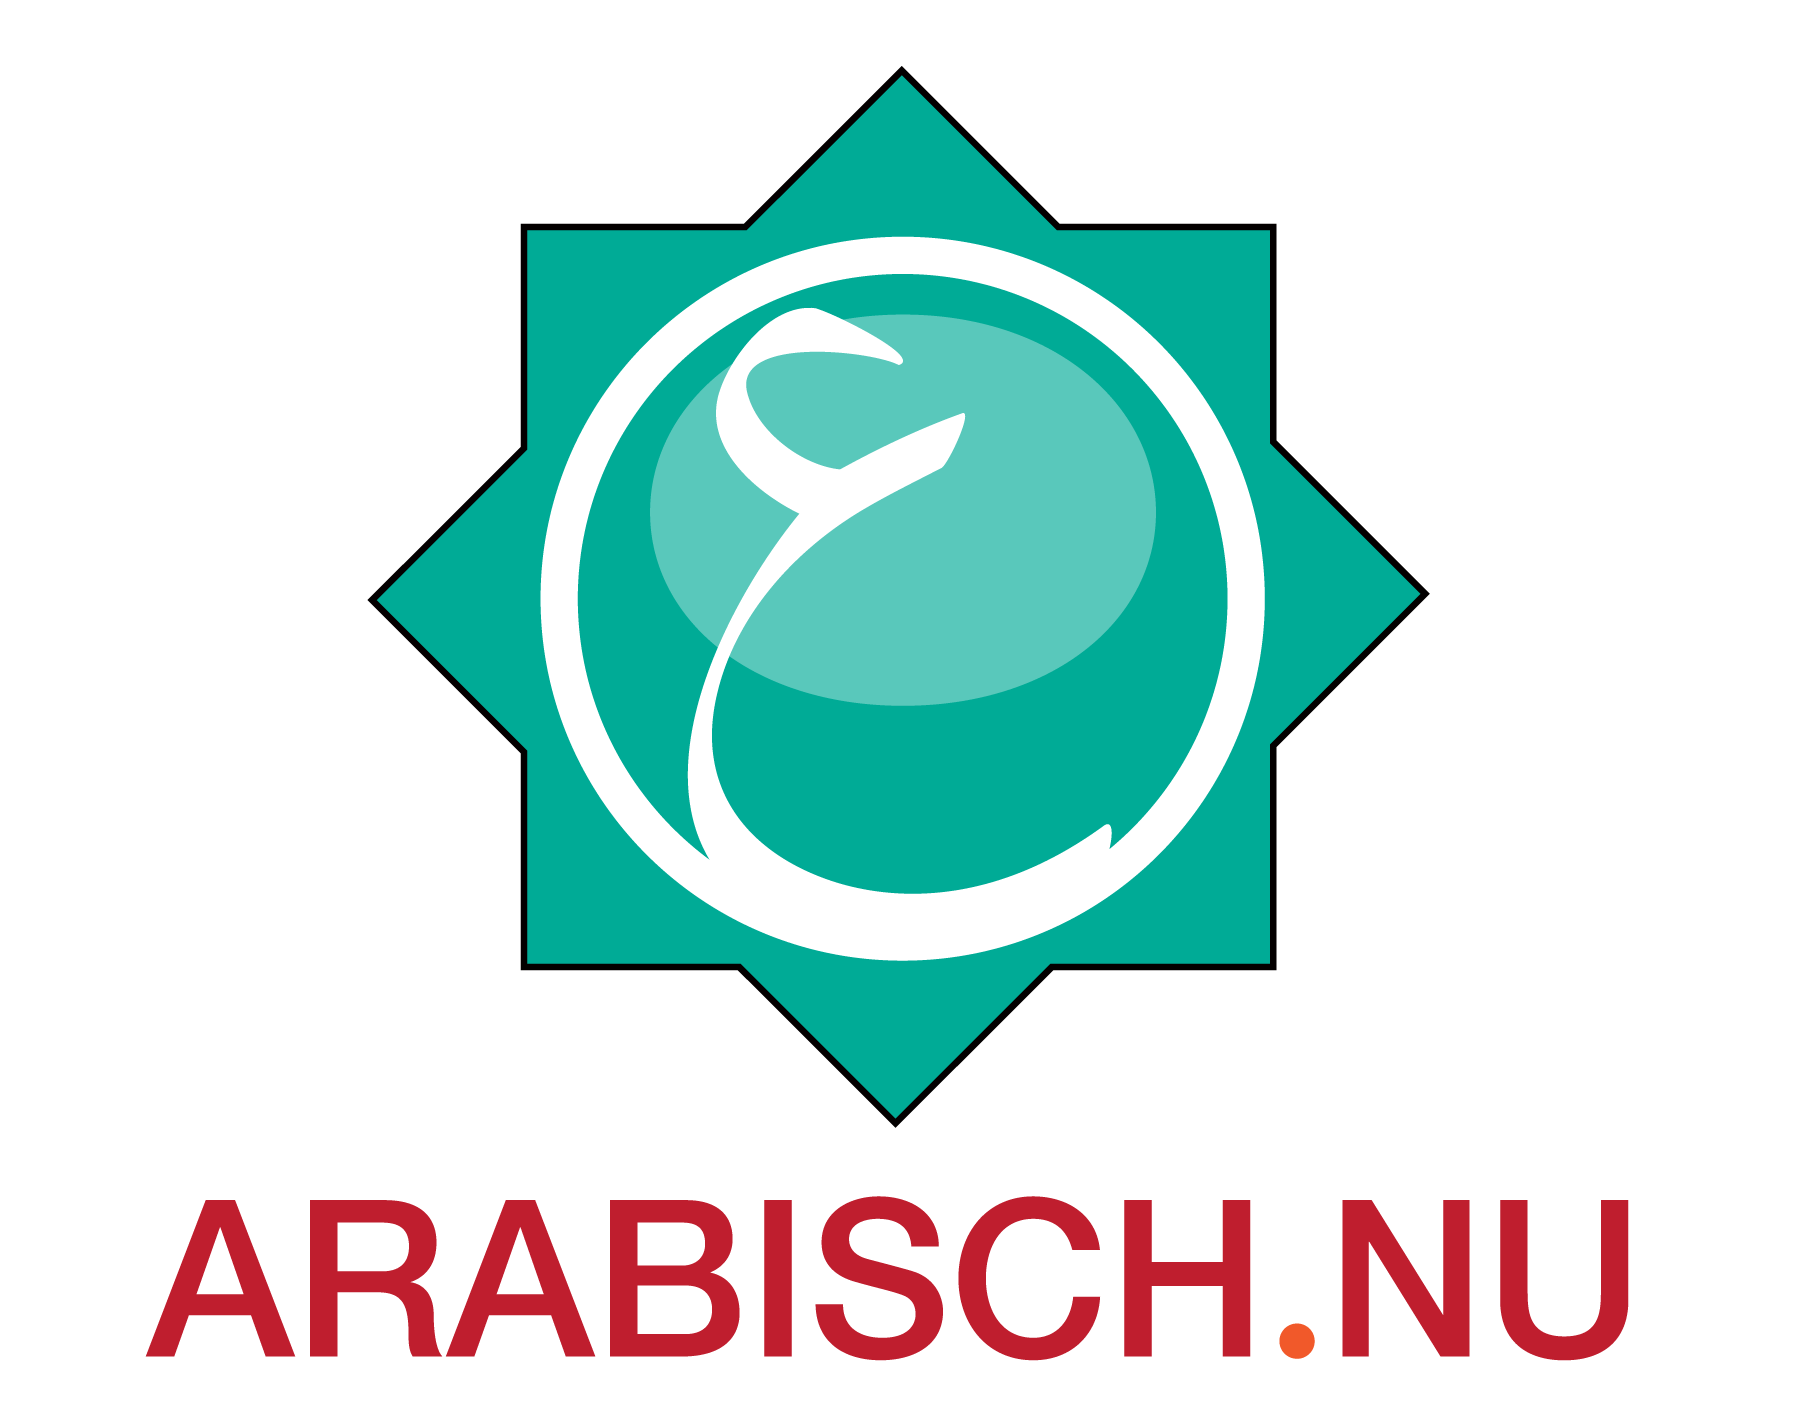 Arabisch.nu